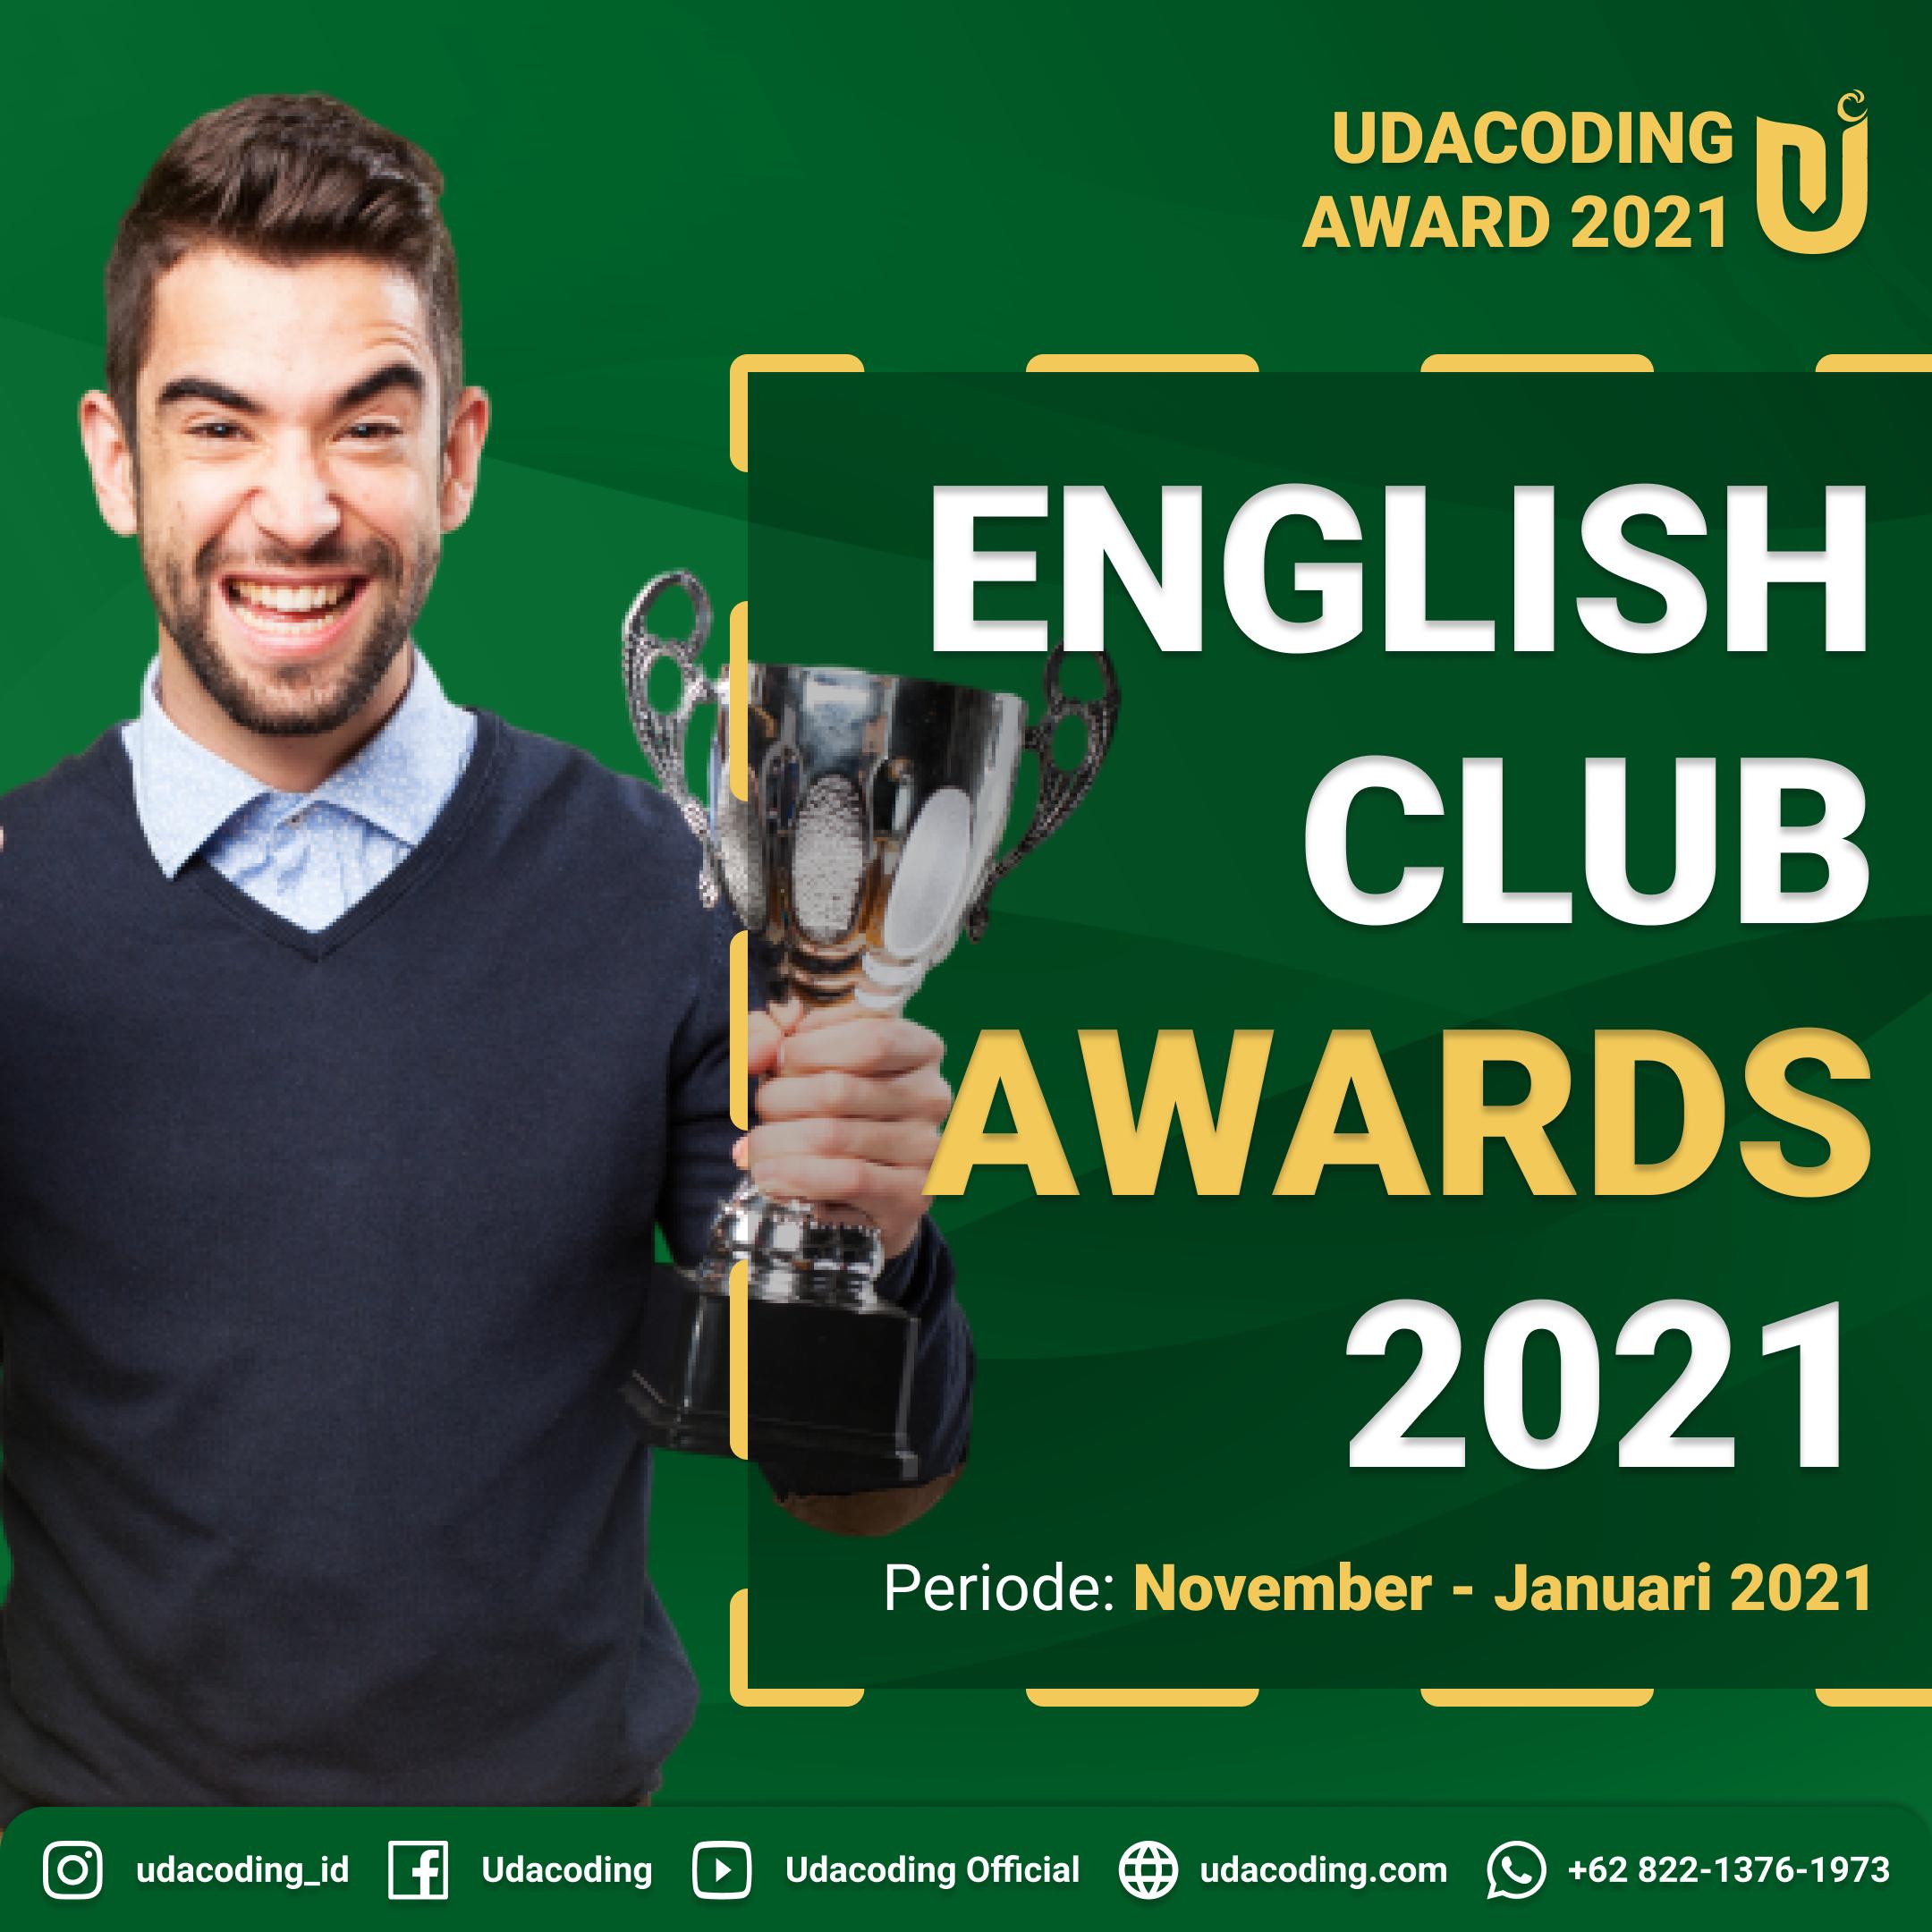 ENGLISH-CLUB-AWARDS-1 Our Blog